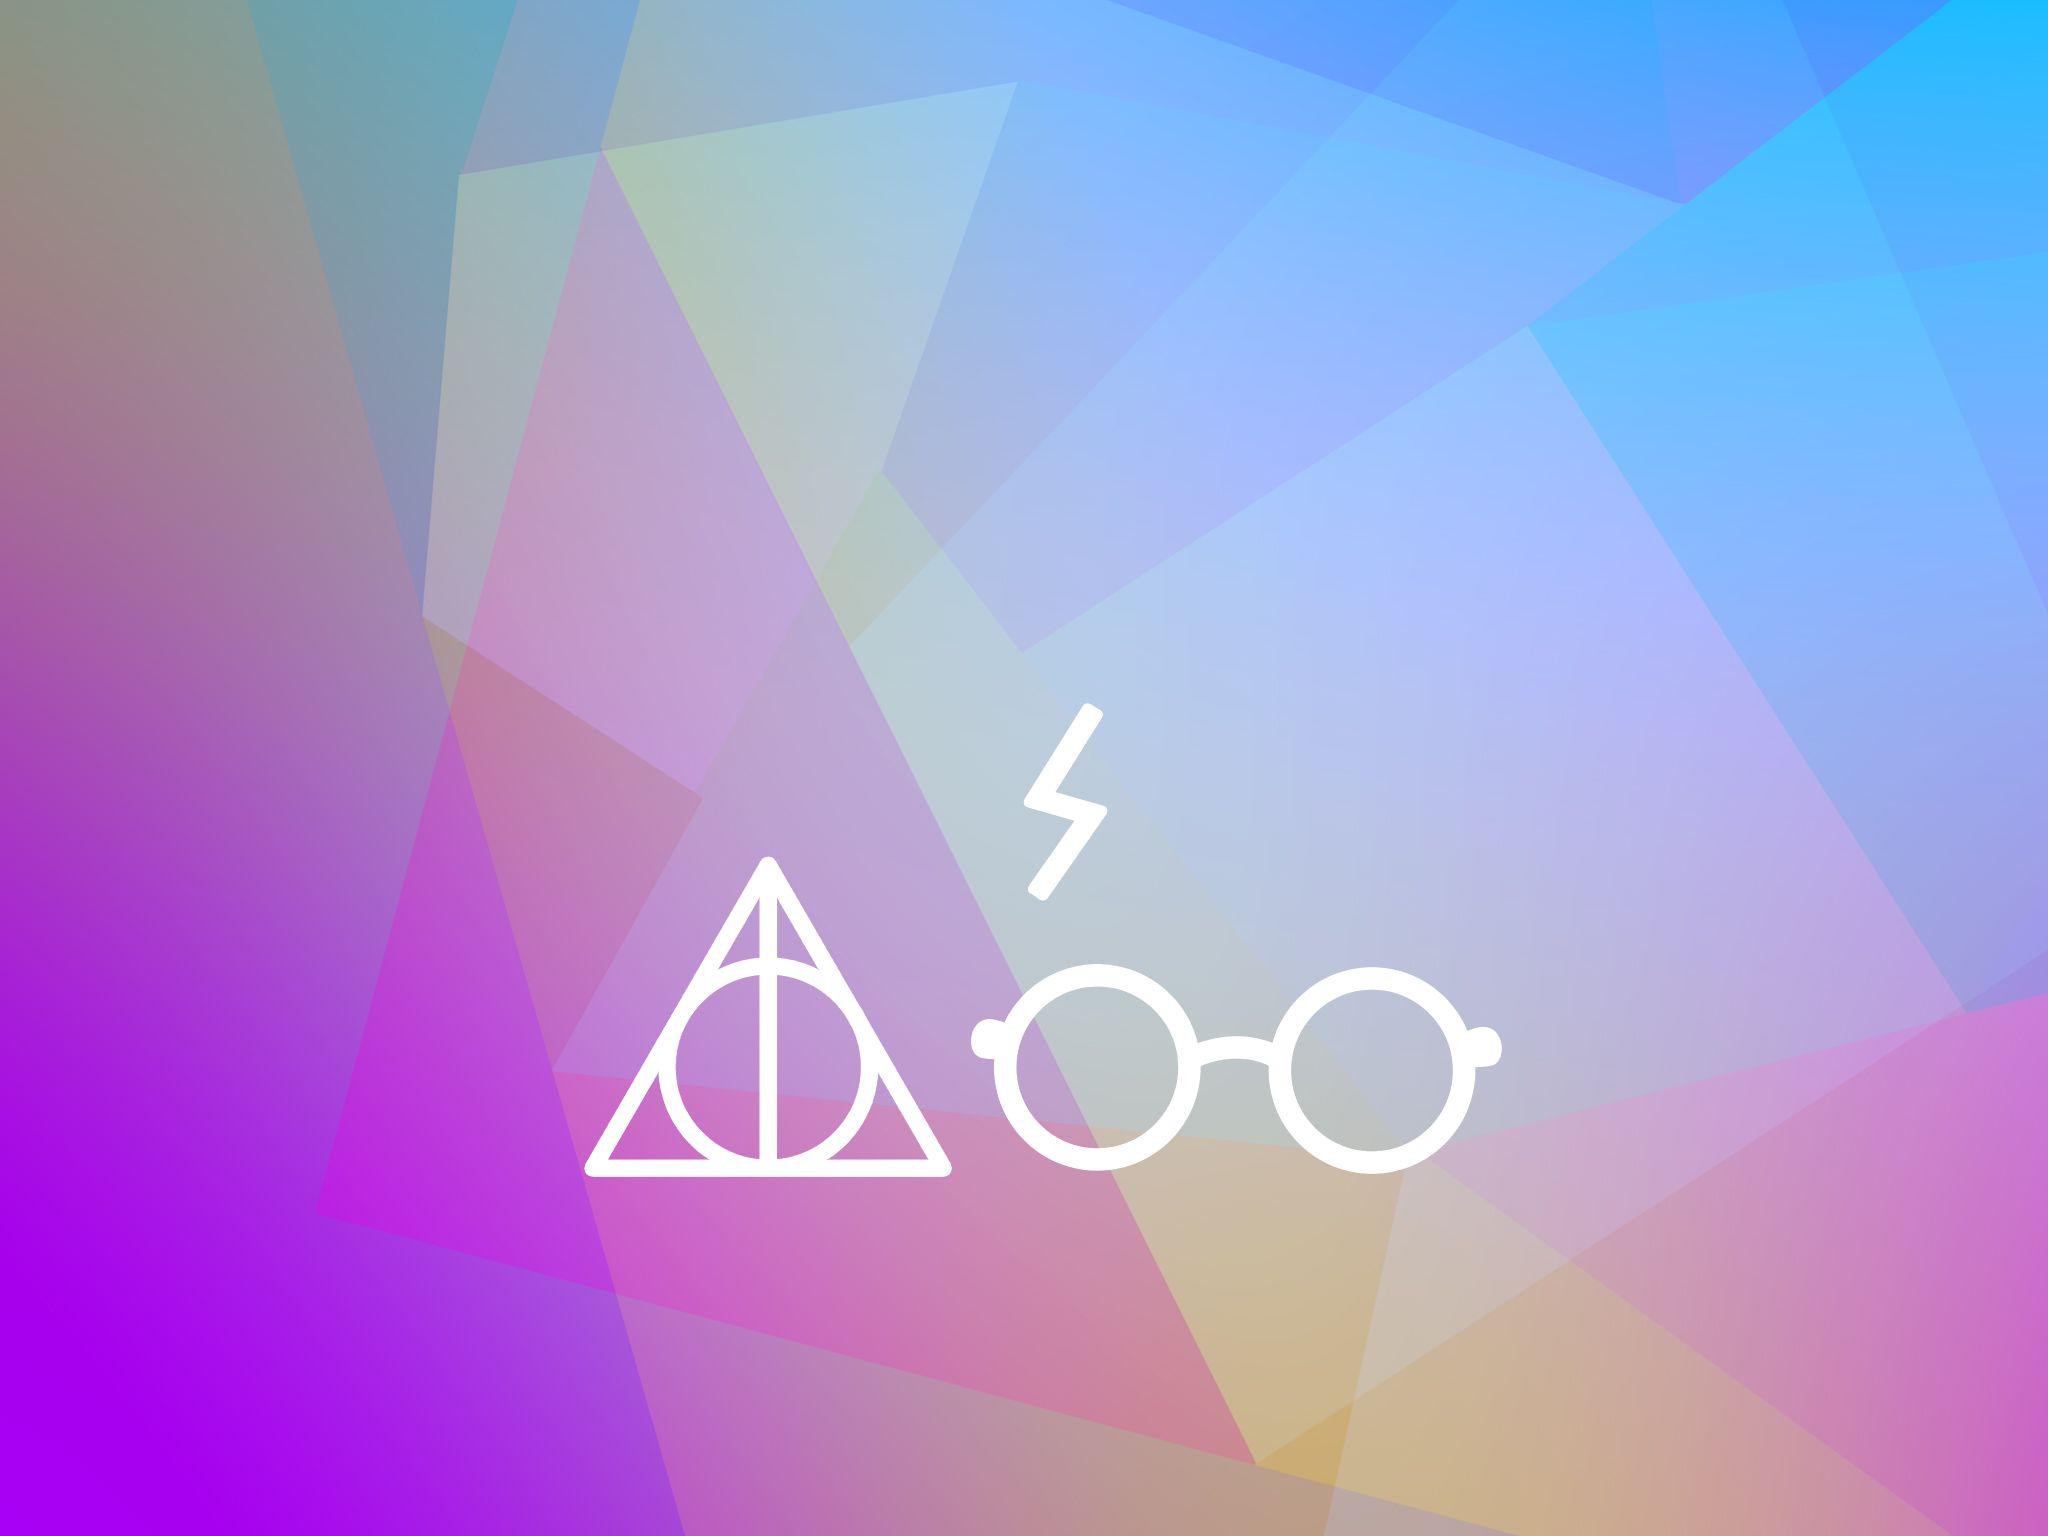 Geeky Wallpapers - Harry Potter Wallpaper Ipad - HD Wallpaper